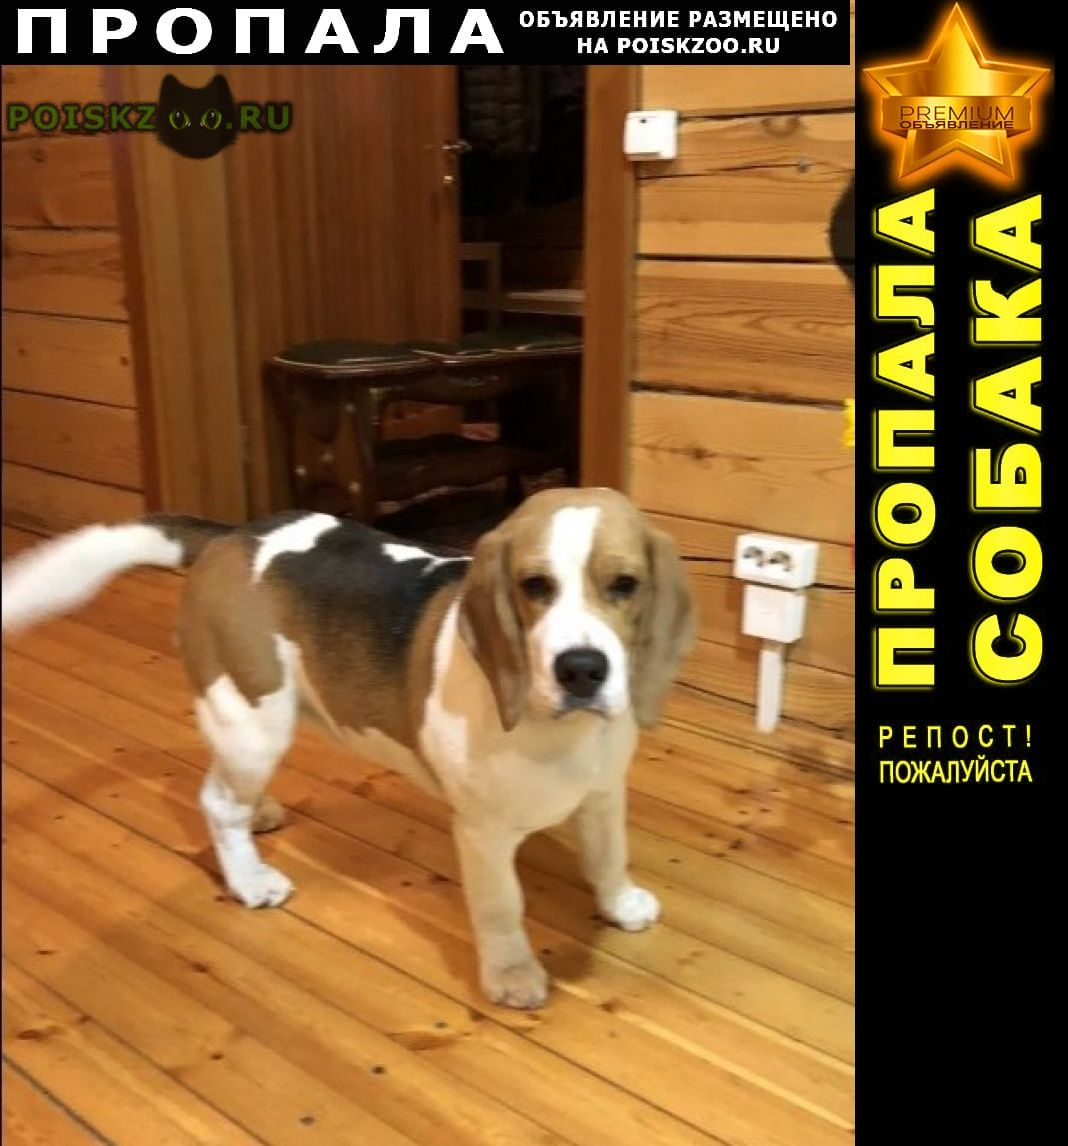 Пропала собака кобель бигль г.Иркутск